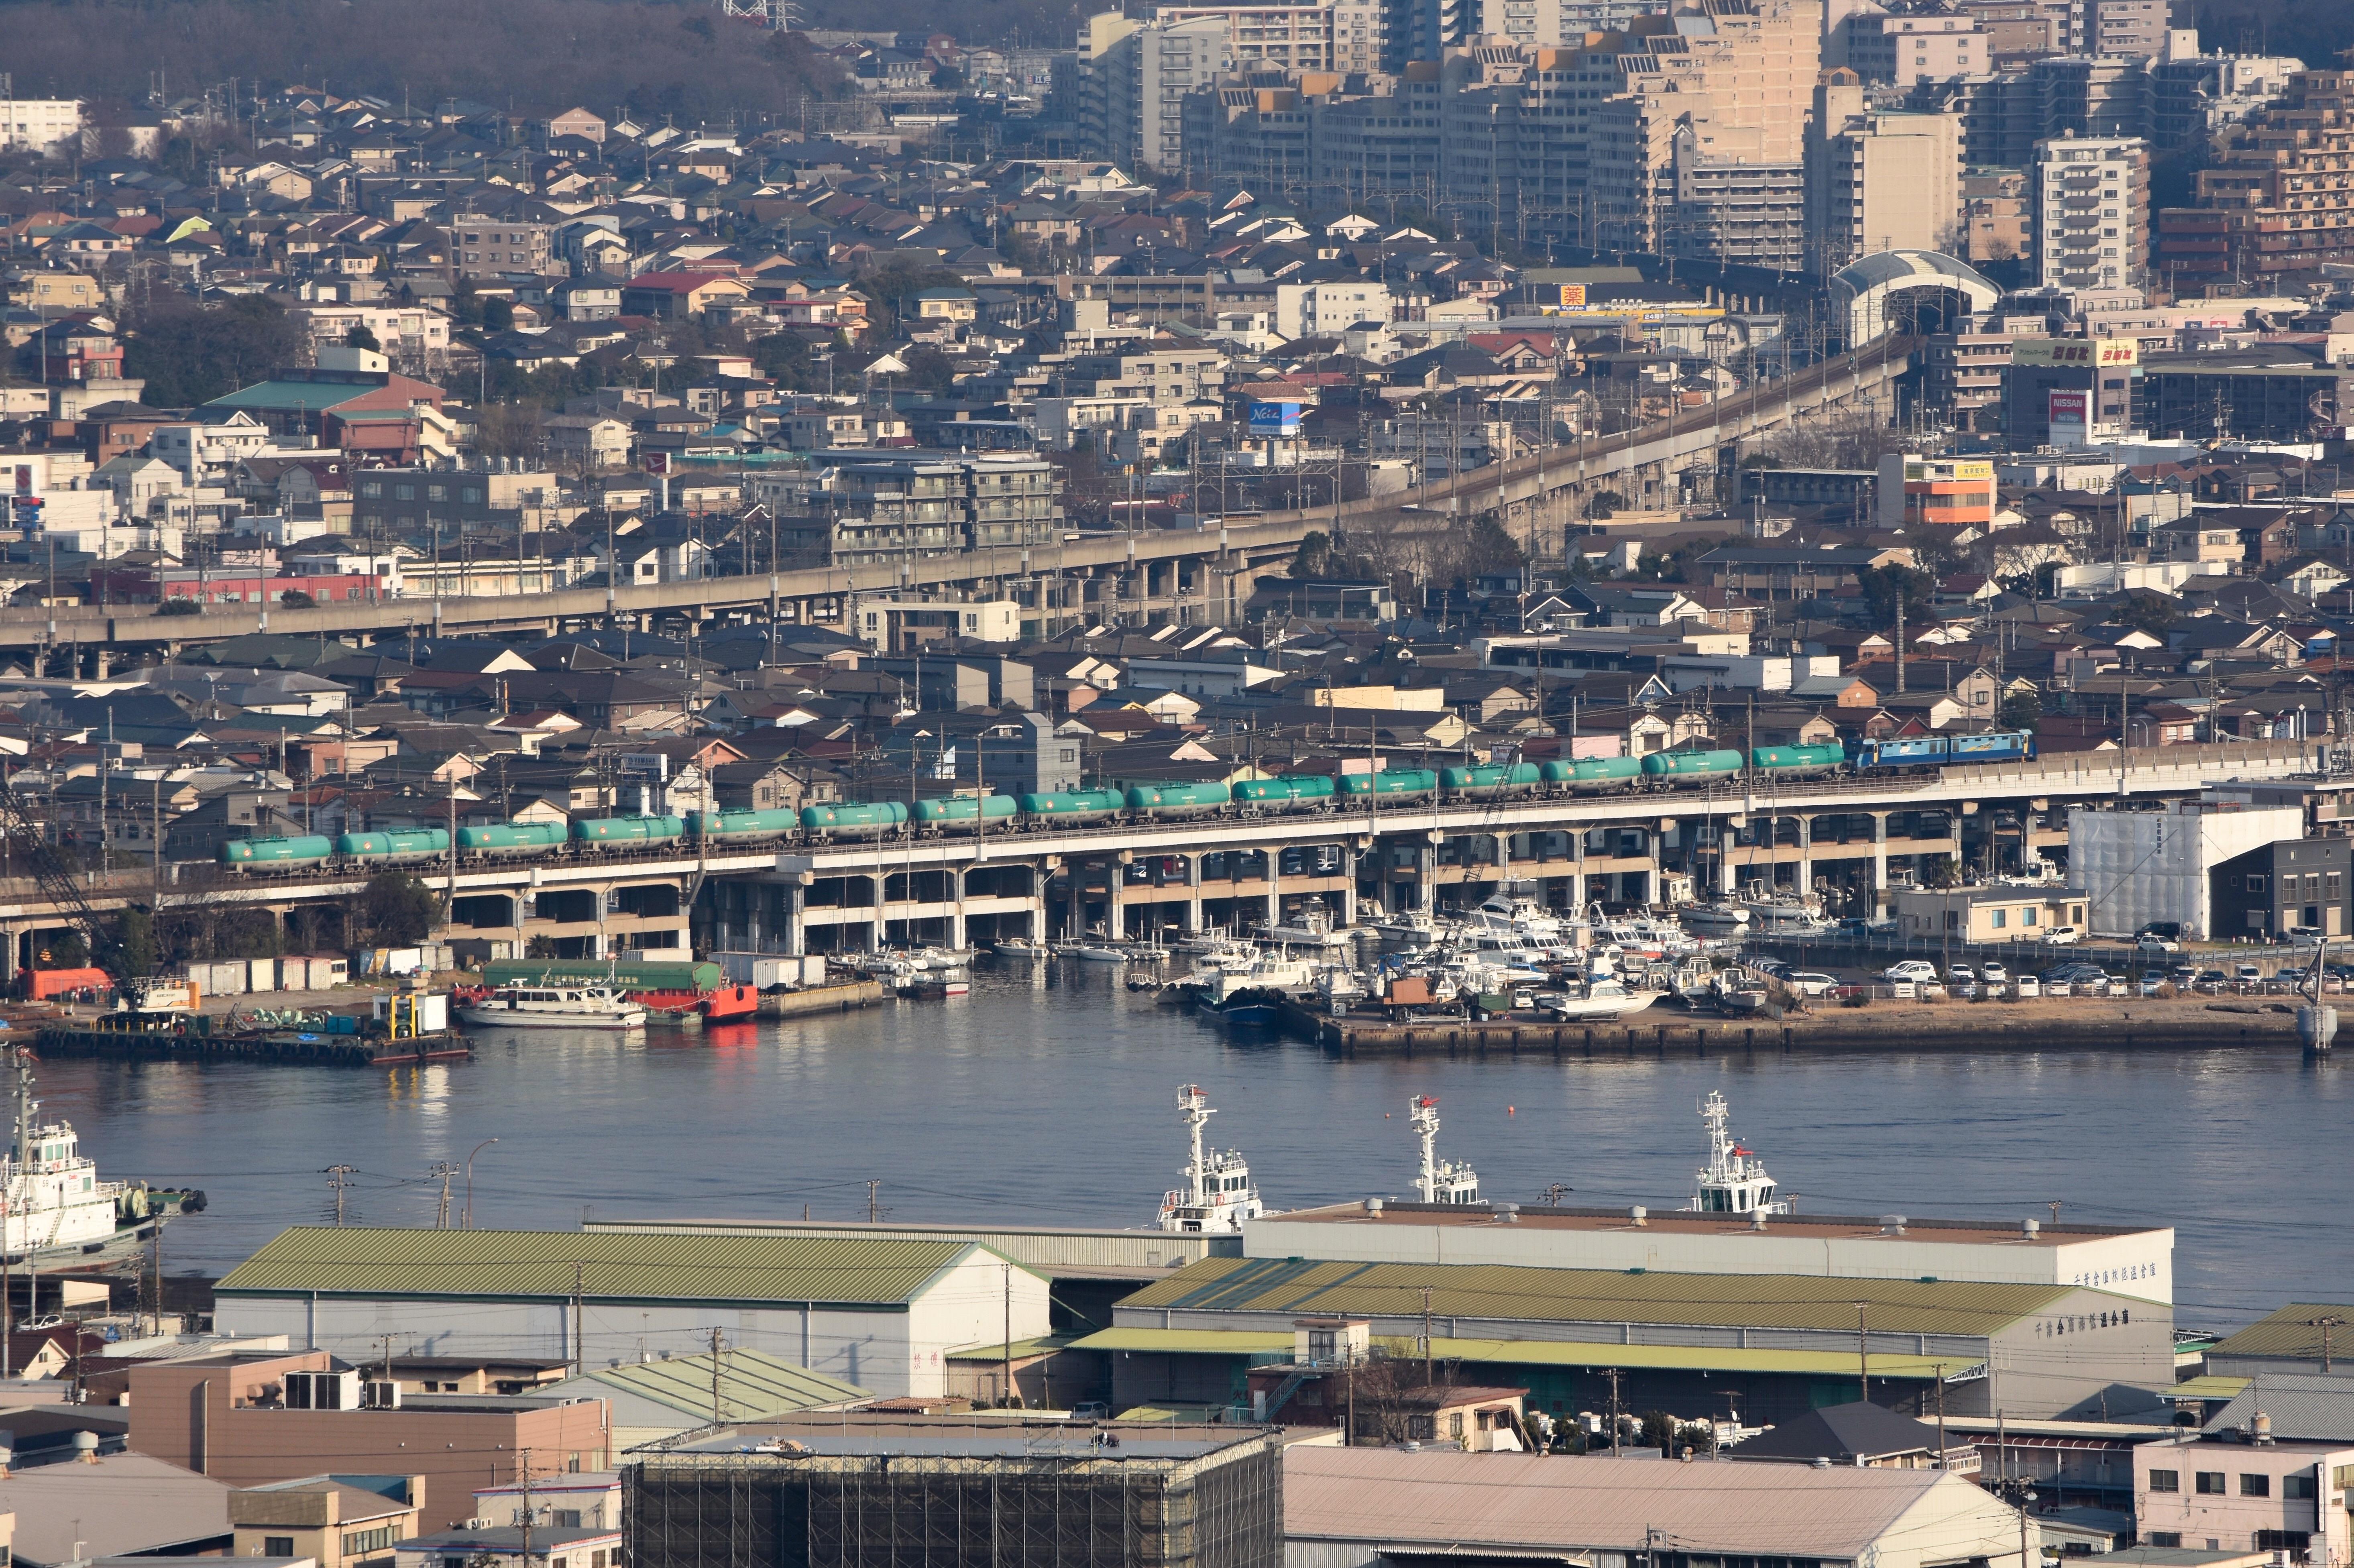 f:id:Nagaoka103:20190302214201j:image